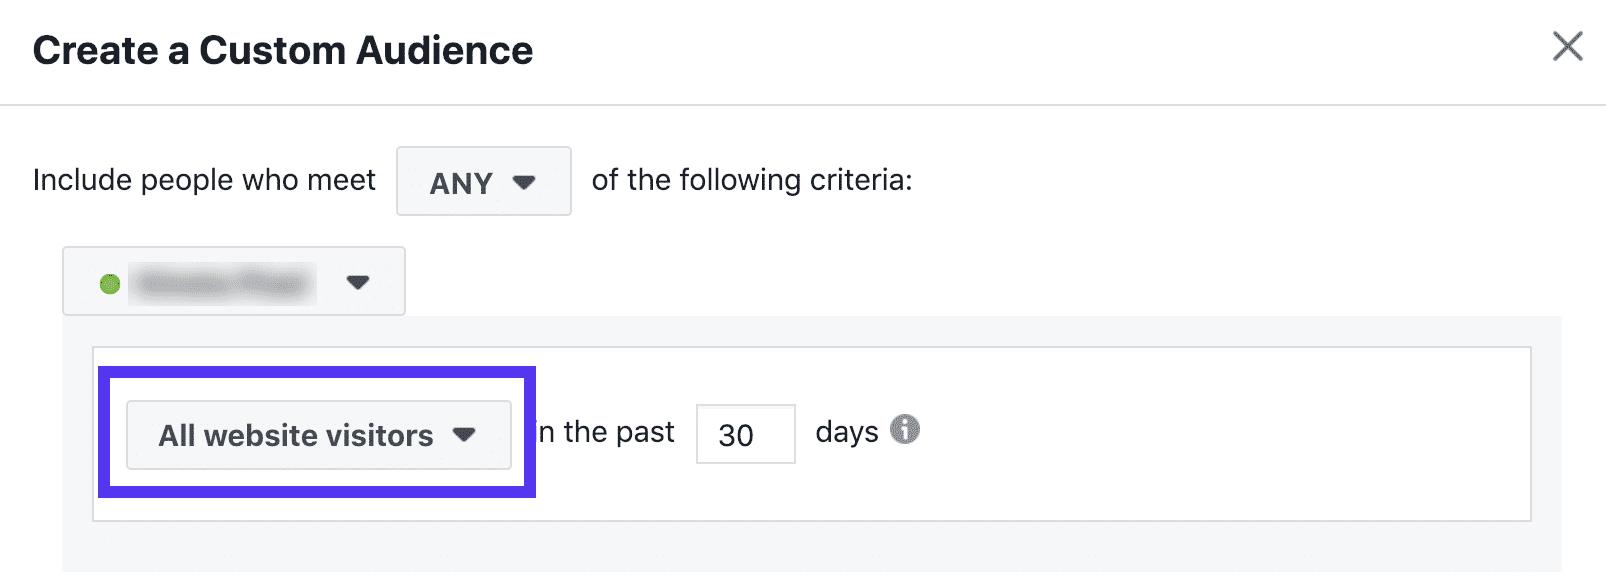 Audience di retargeting in Facebook - ultimi 30 giorni